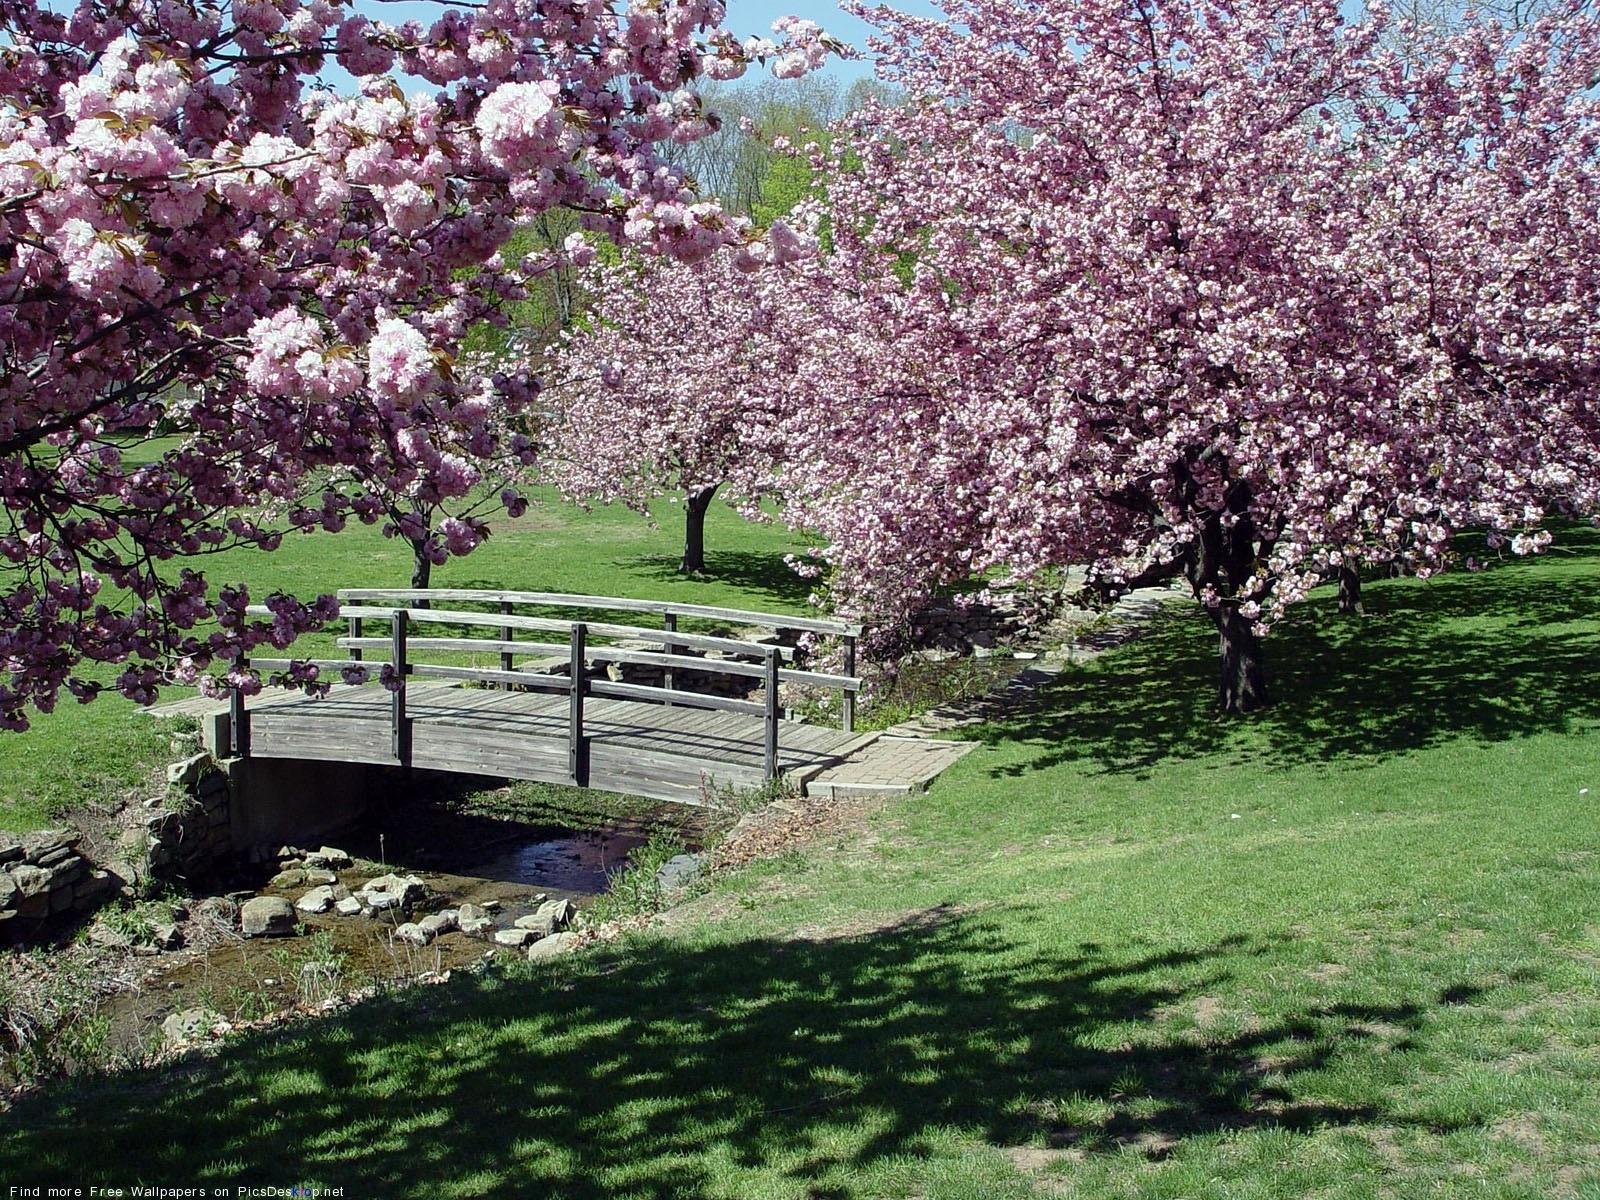 Весна сакура, мост, цветы, япония фото ...: priroda-foto.ucoz.ru/photo/vesna/sakura_most_cvety_japonija/1-0-185